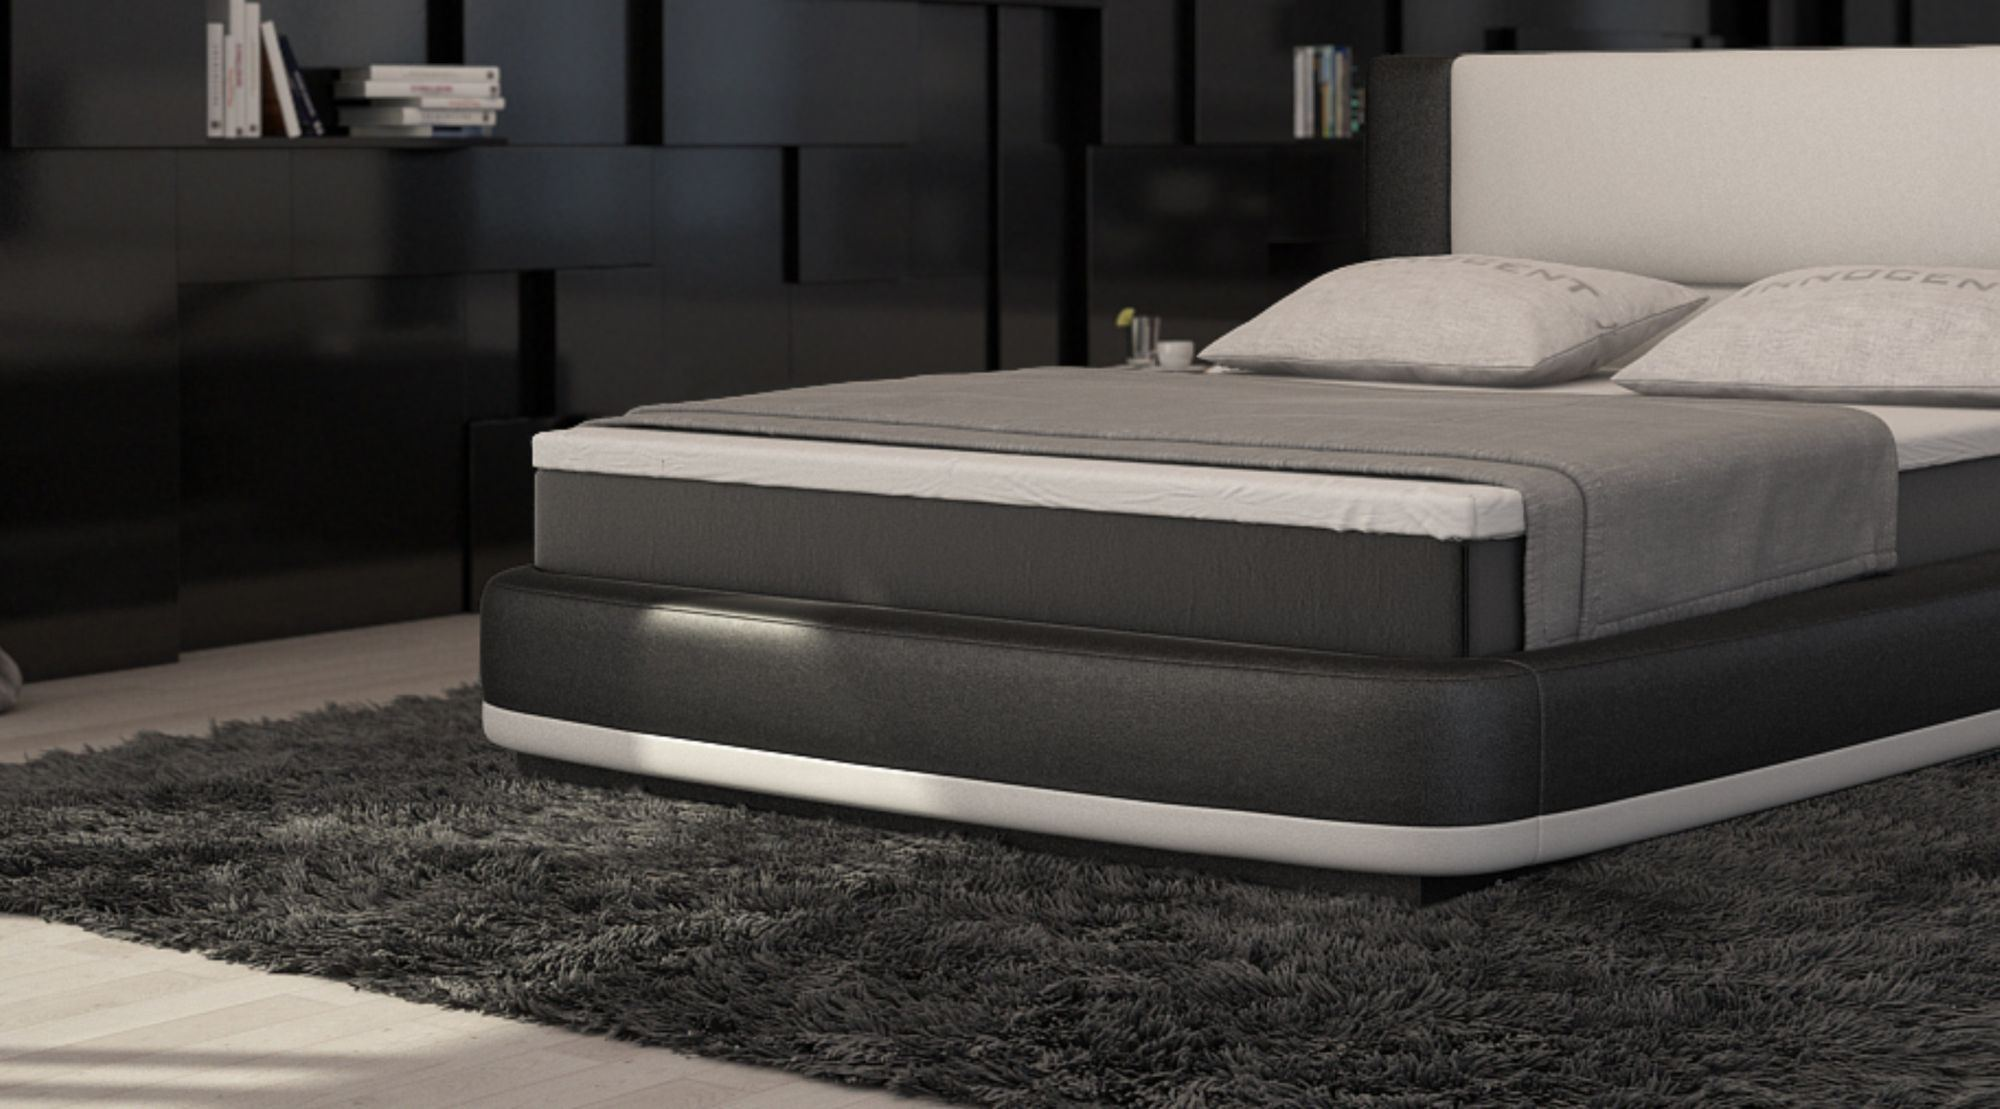 boxspringbett aquila design polsterbett designerbett zweifarbig ebay. Black Bedroom Furniture Sets. Home Design Ideas